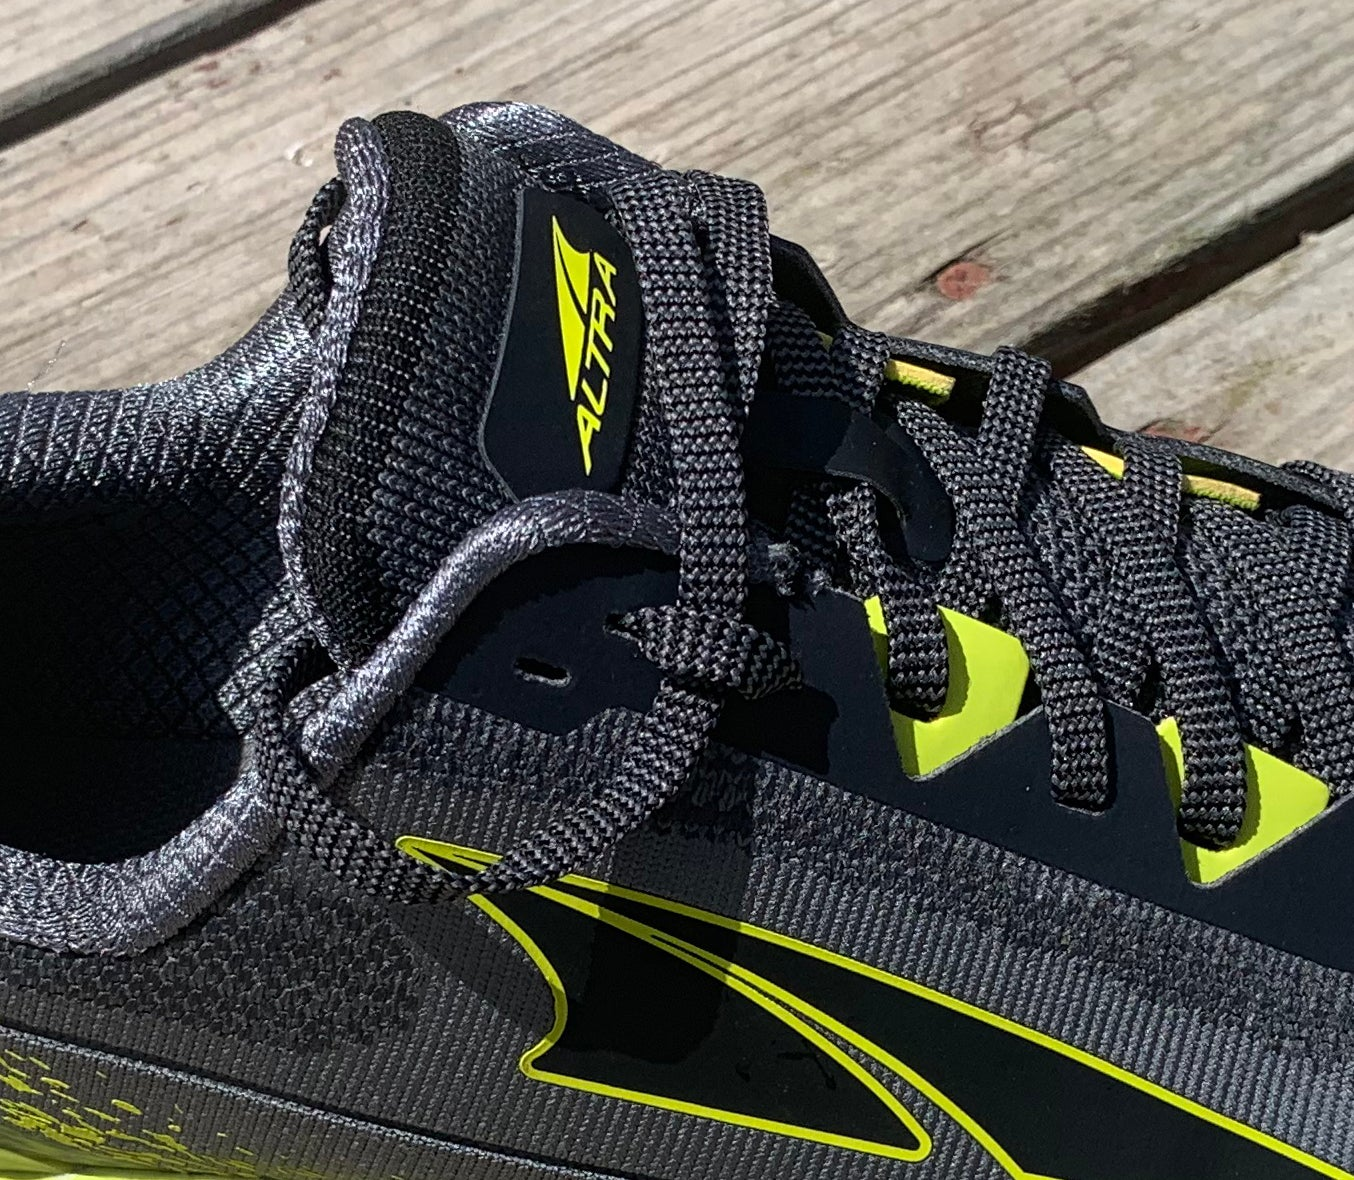 Running Shoe Laces Evolve – PodiumRunner